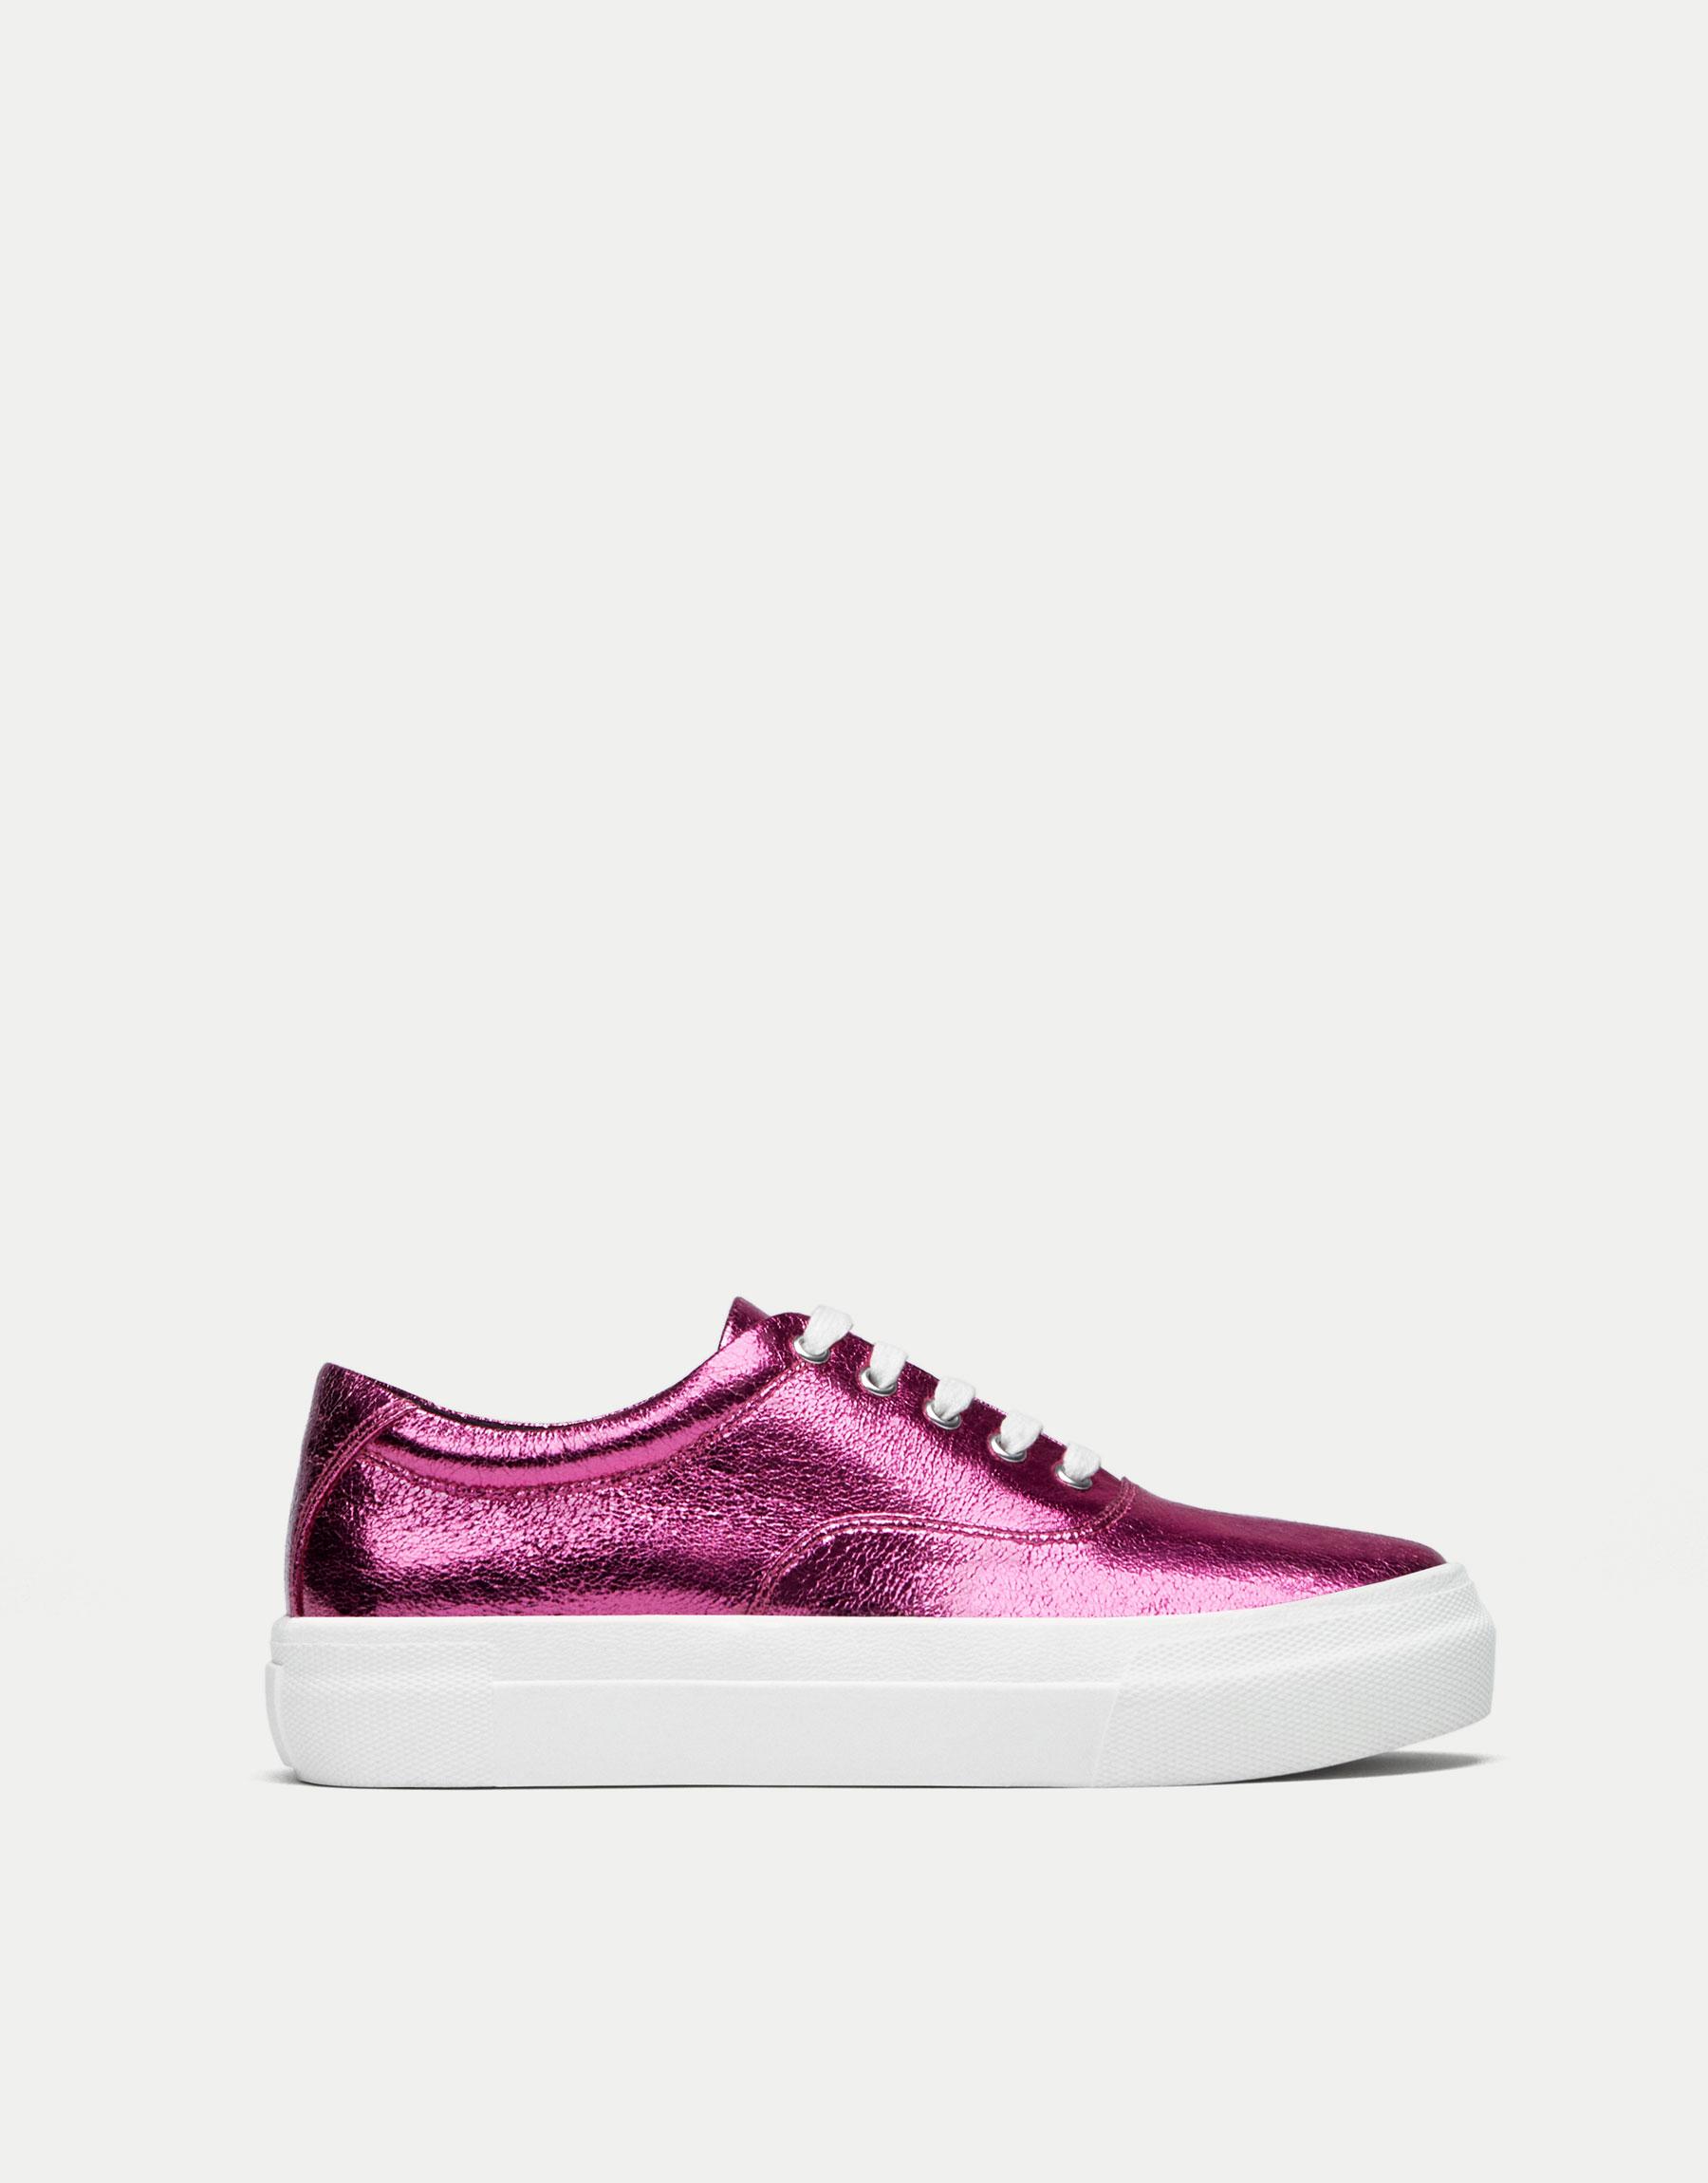 Pinke Sneaker mit Glanzfinish